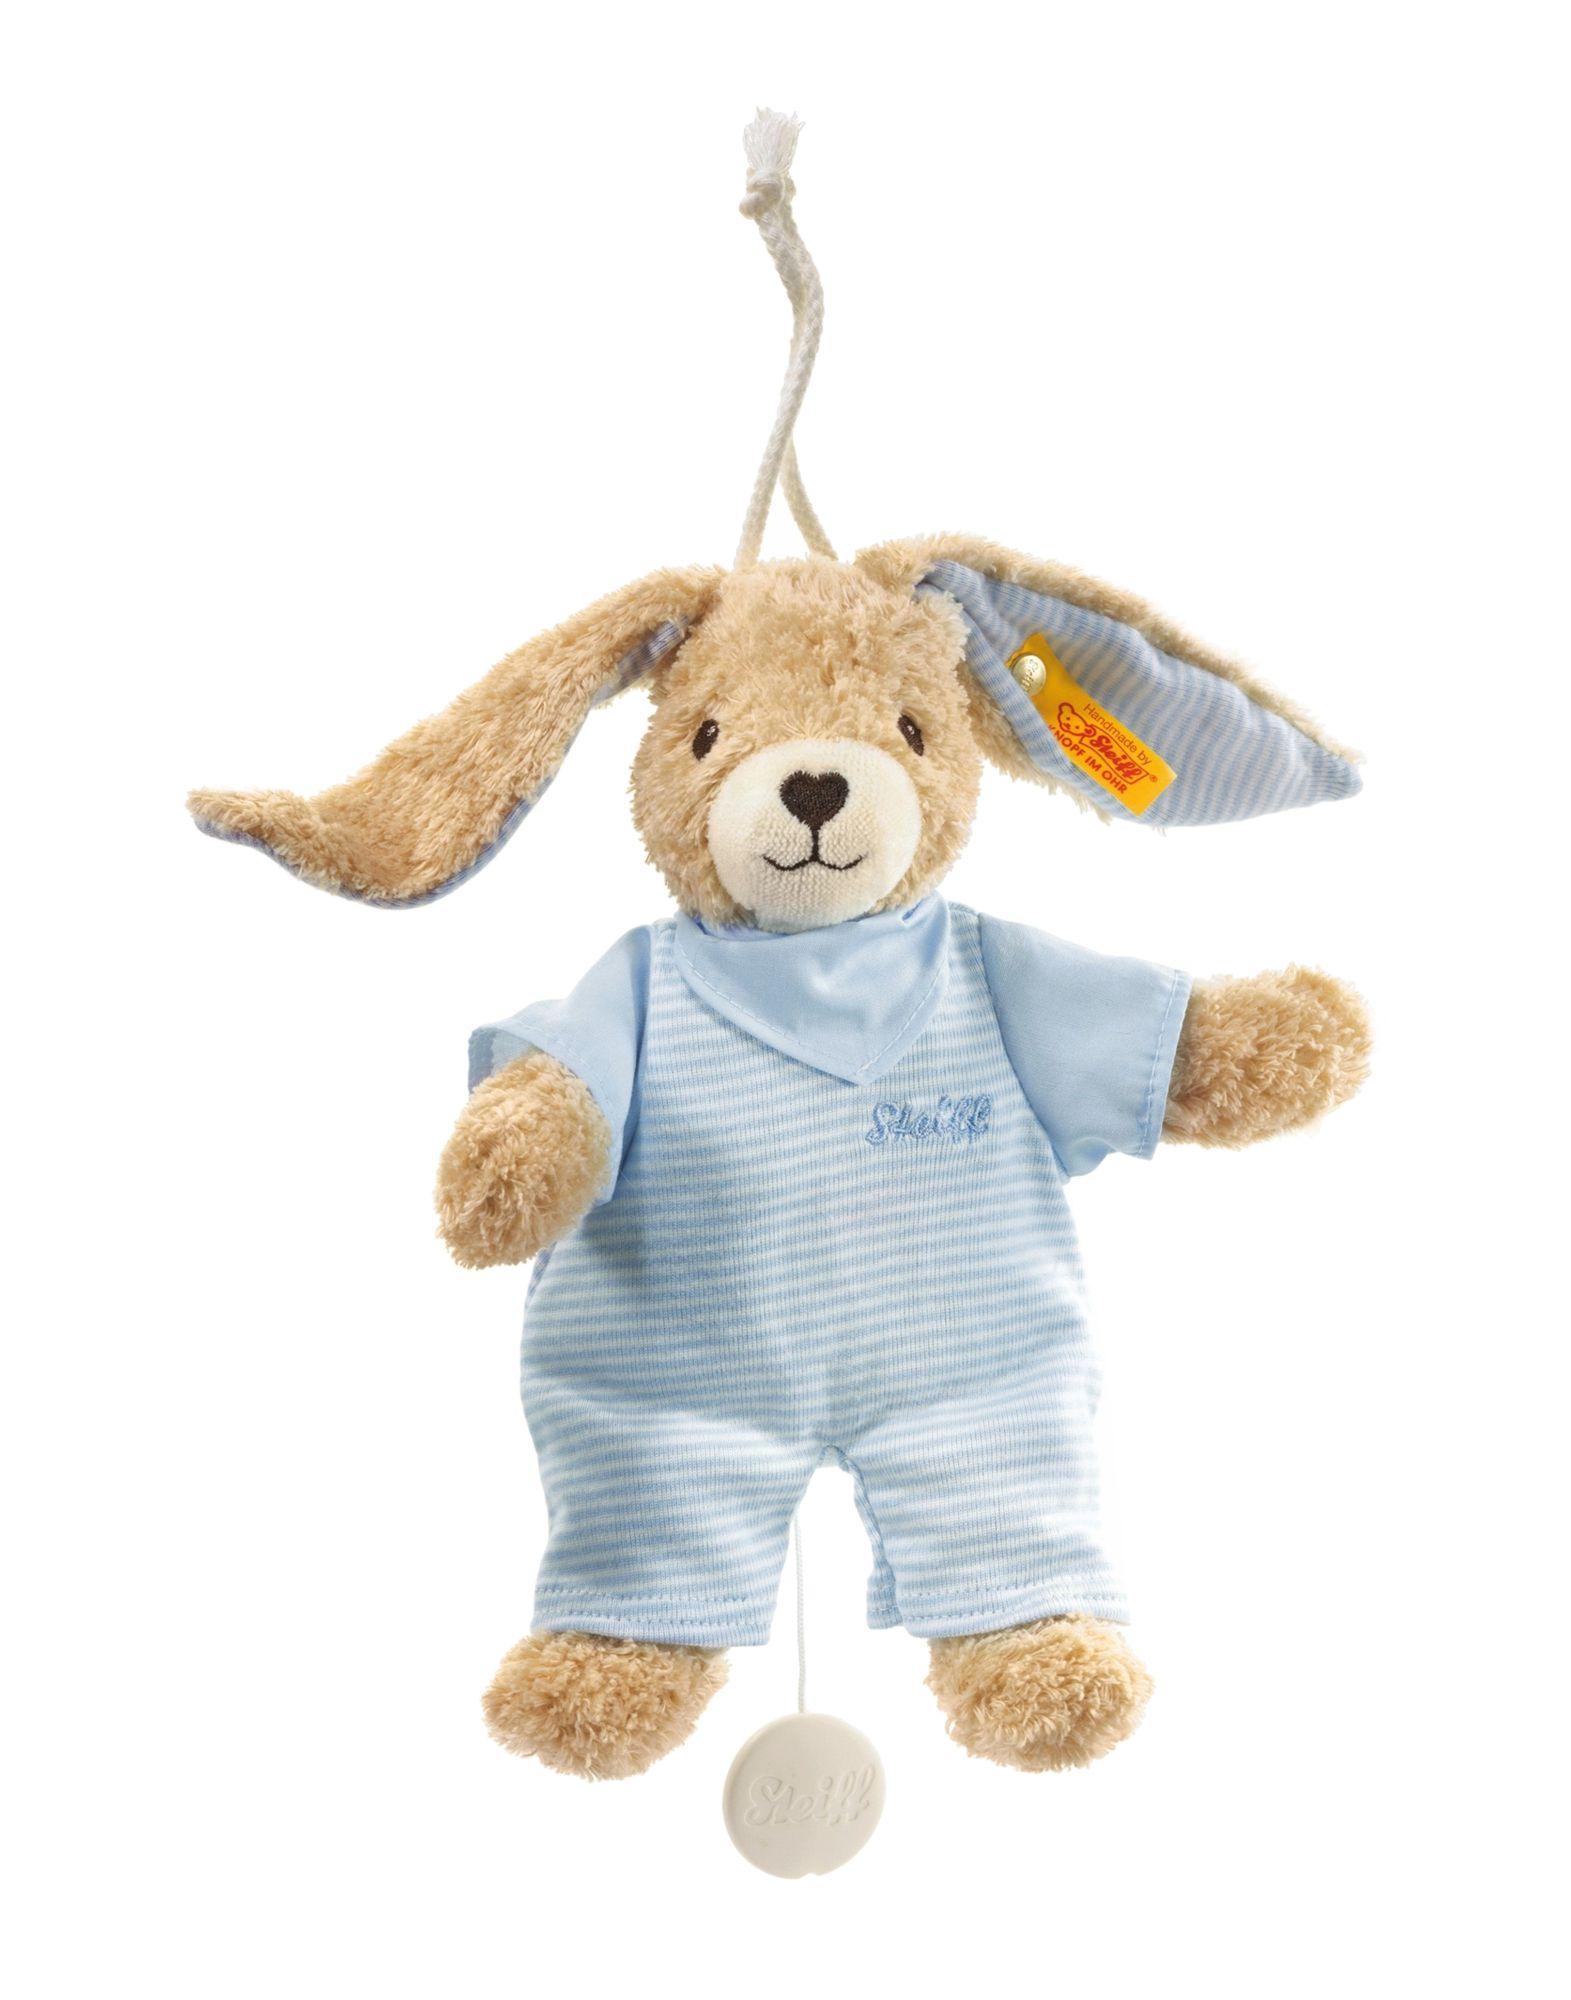 STEIFF Музыкальная мягкая игрушка teddykompaniet музыкальная игрушка альф teddykompaniet